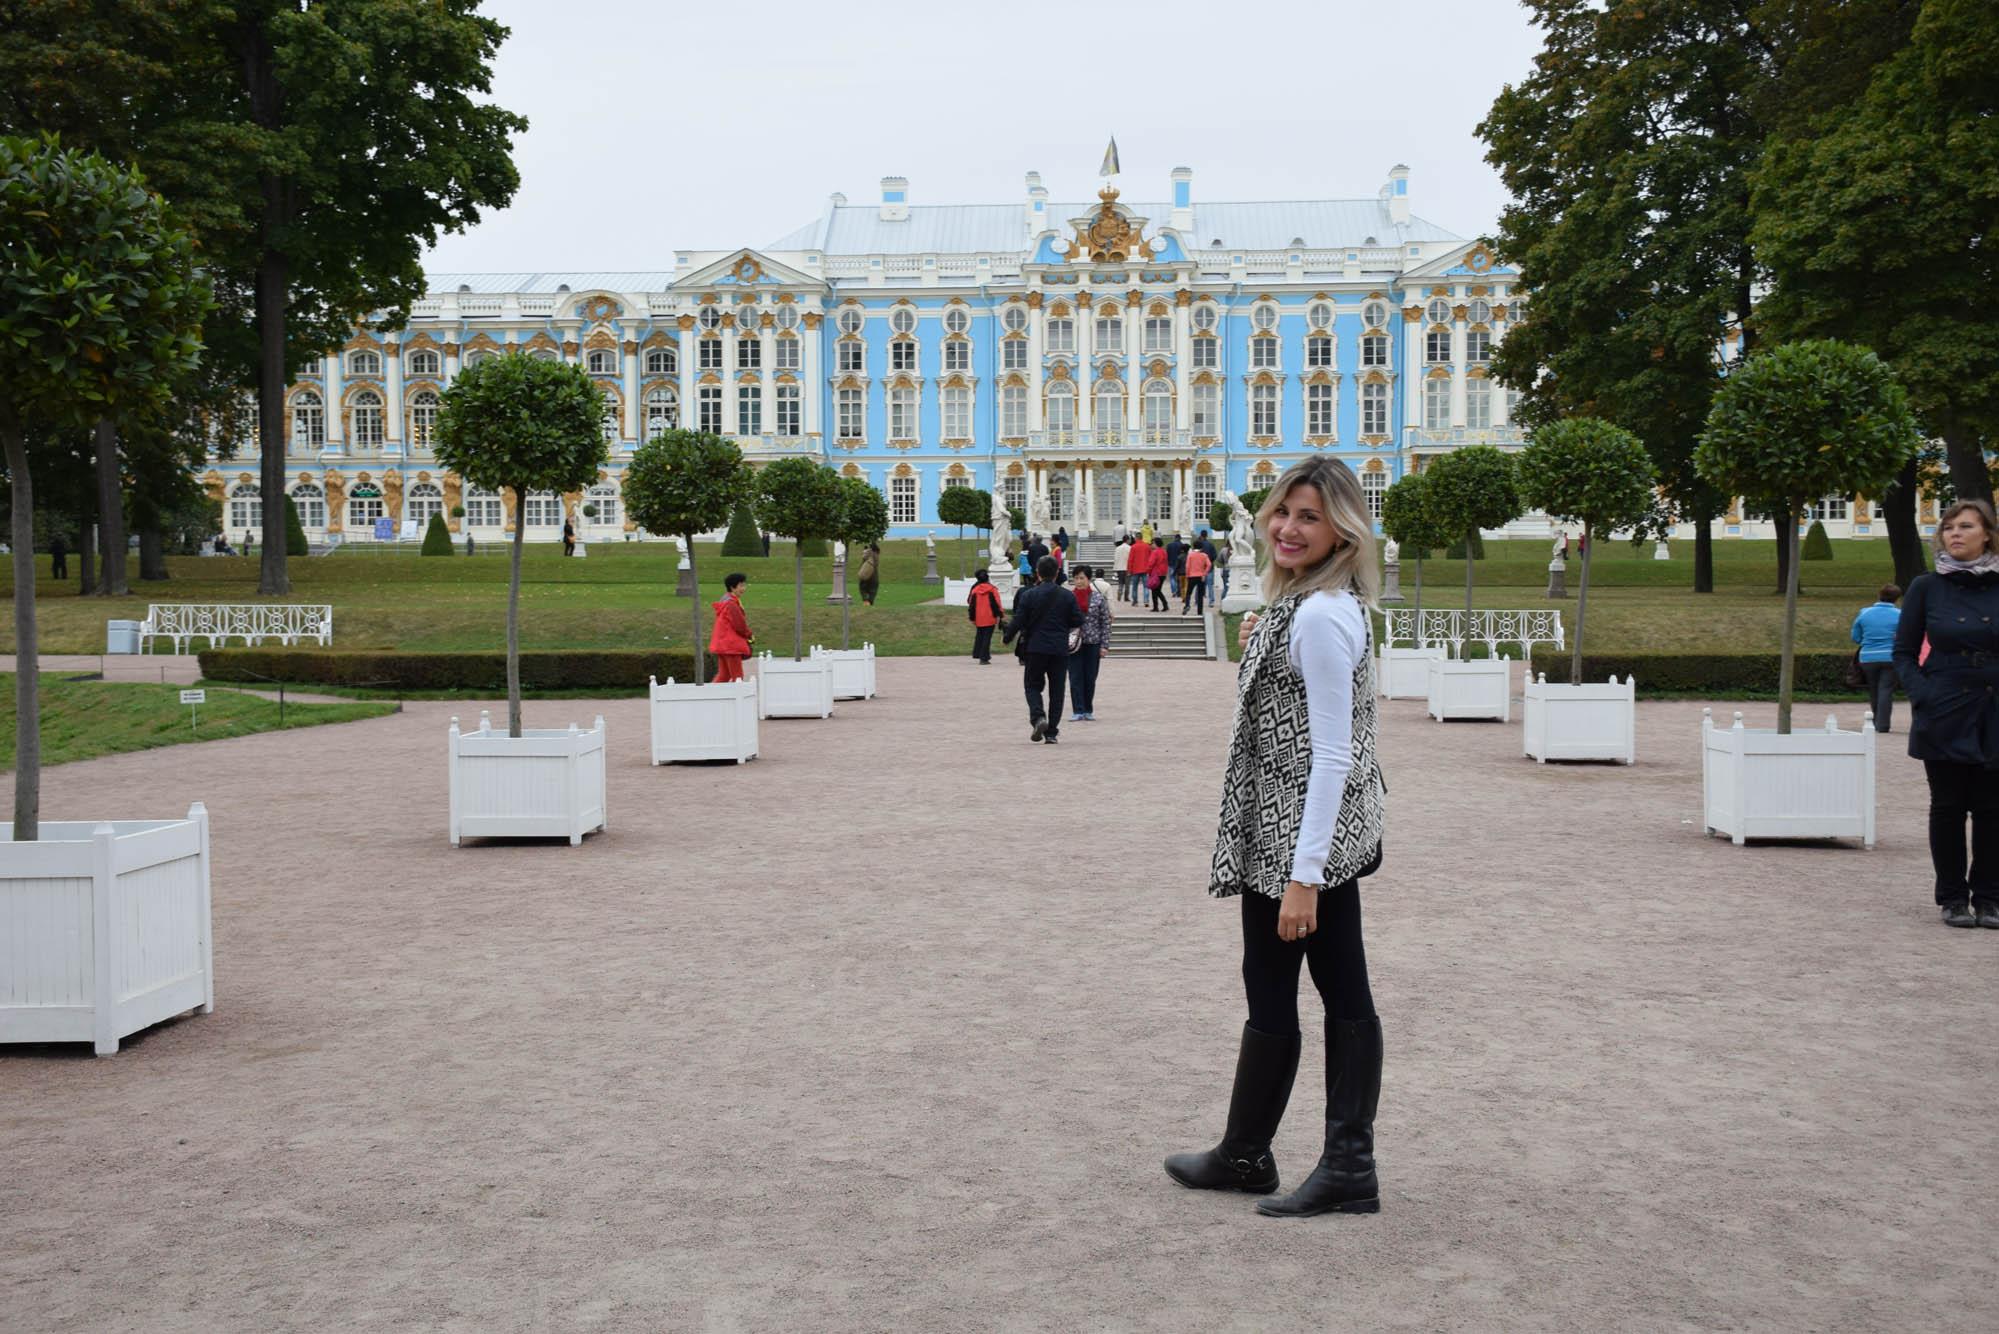 Palácio da Catarina - Tsarkoe Selo - sao petersburgo